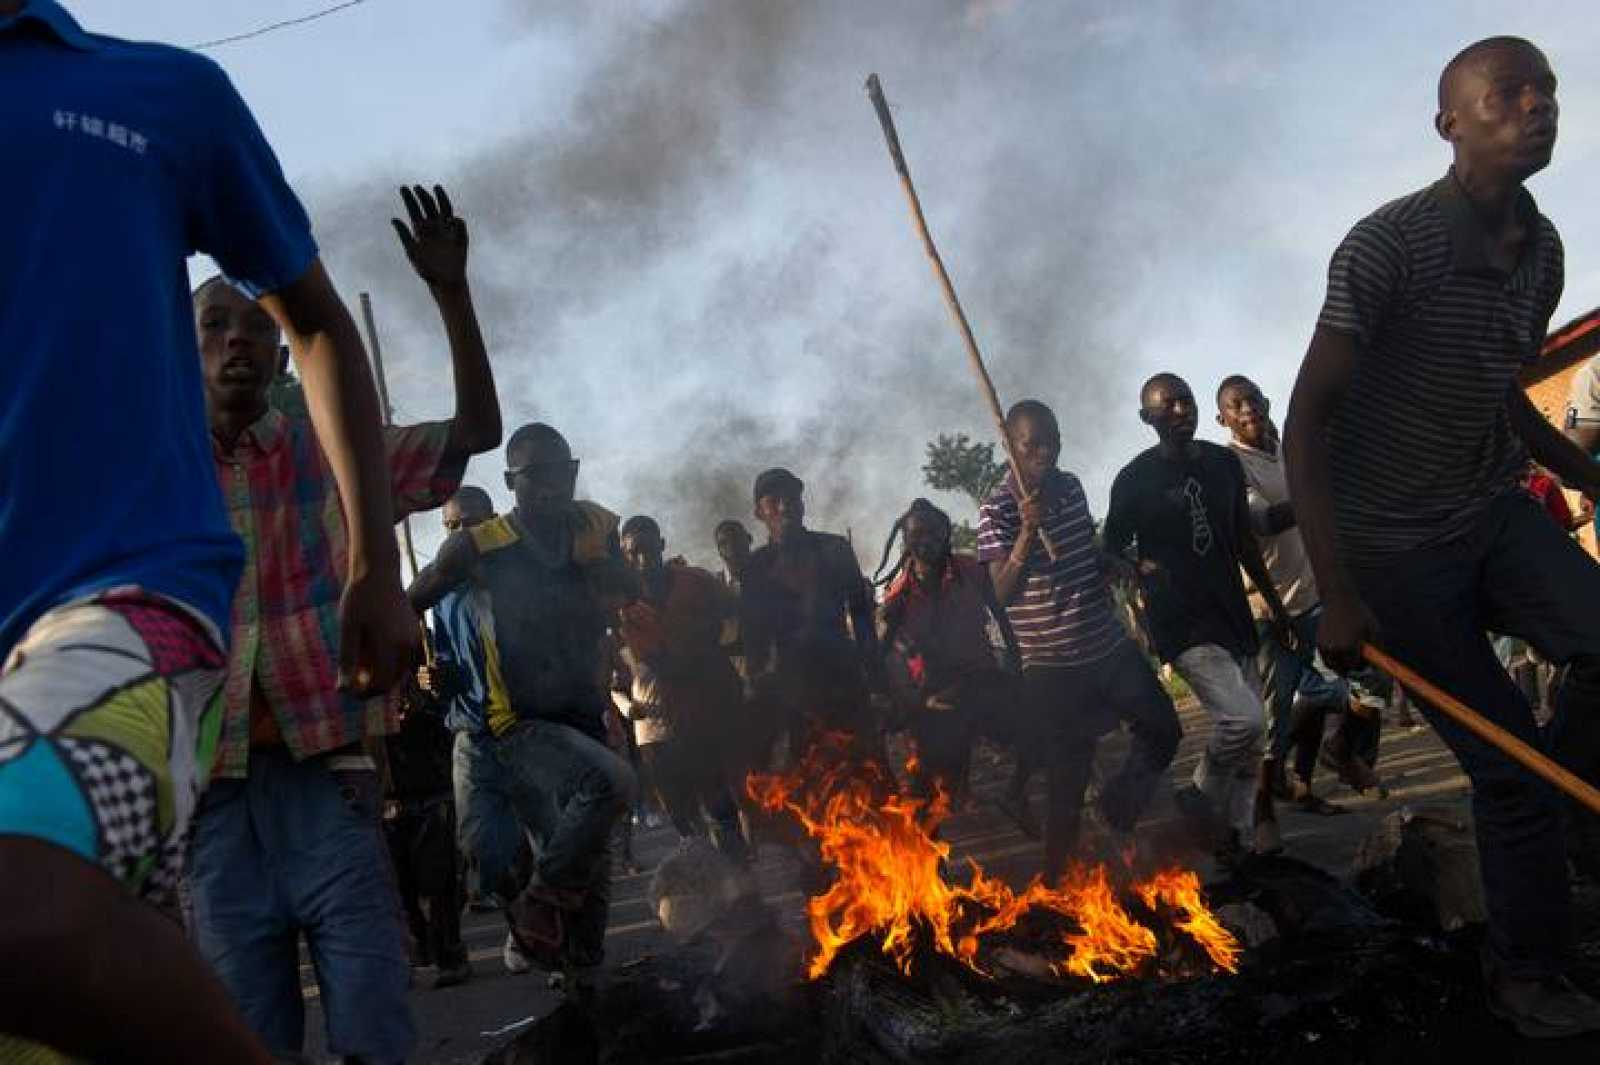 Manifestantes cruzan las líneas policiales en Bujumbura, Burundi